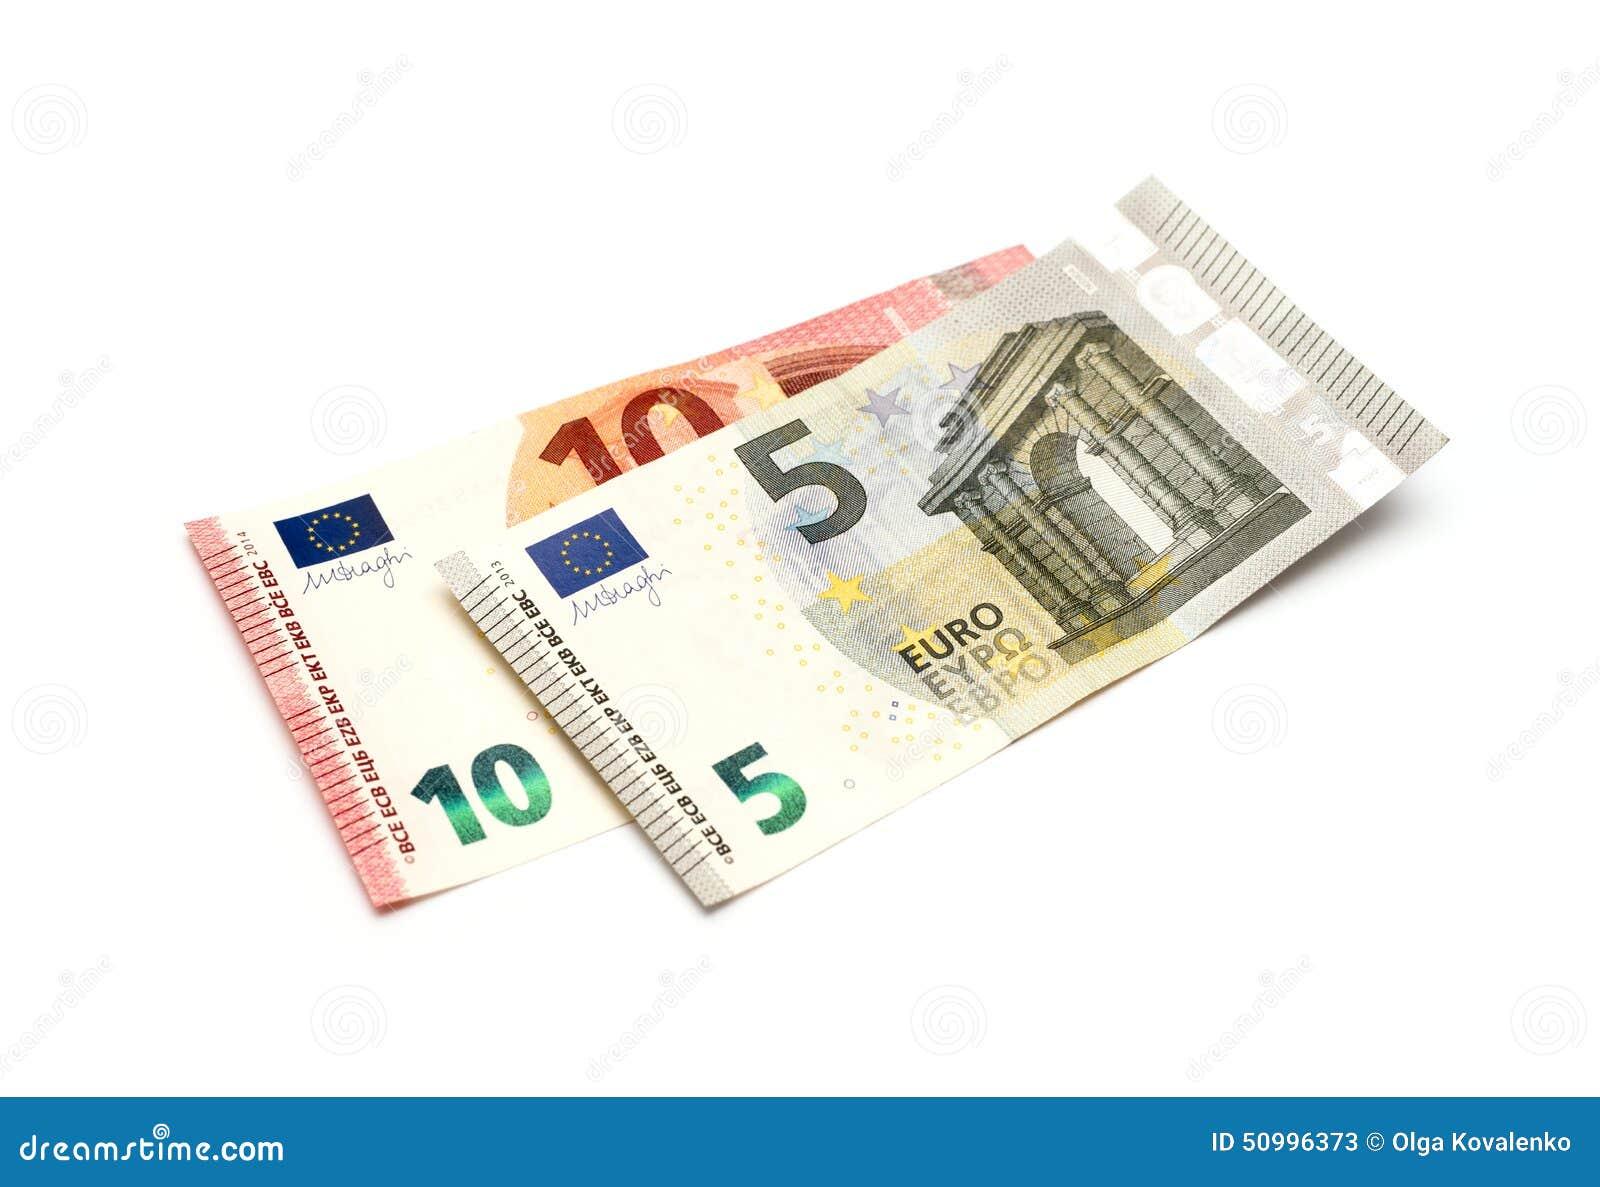 Cinco y diez euros